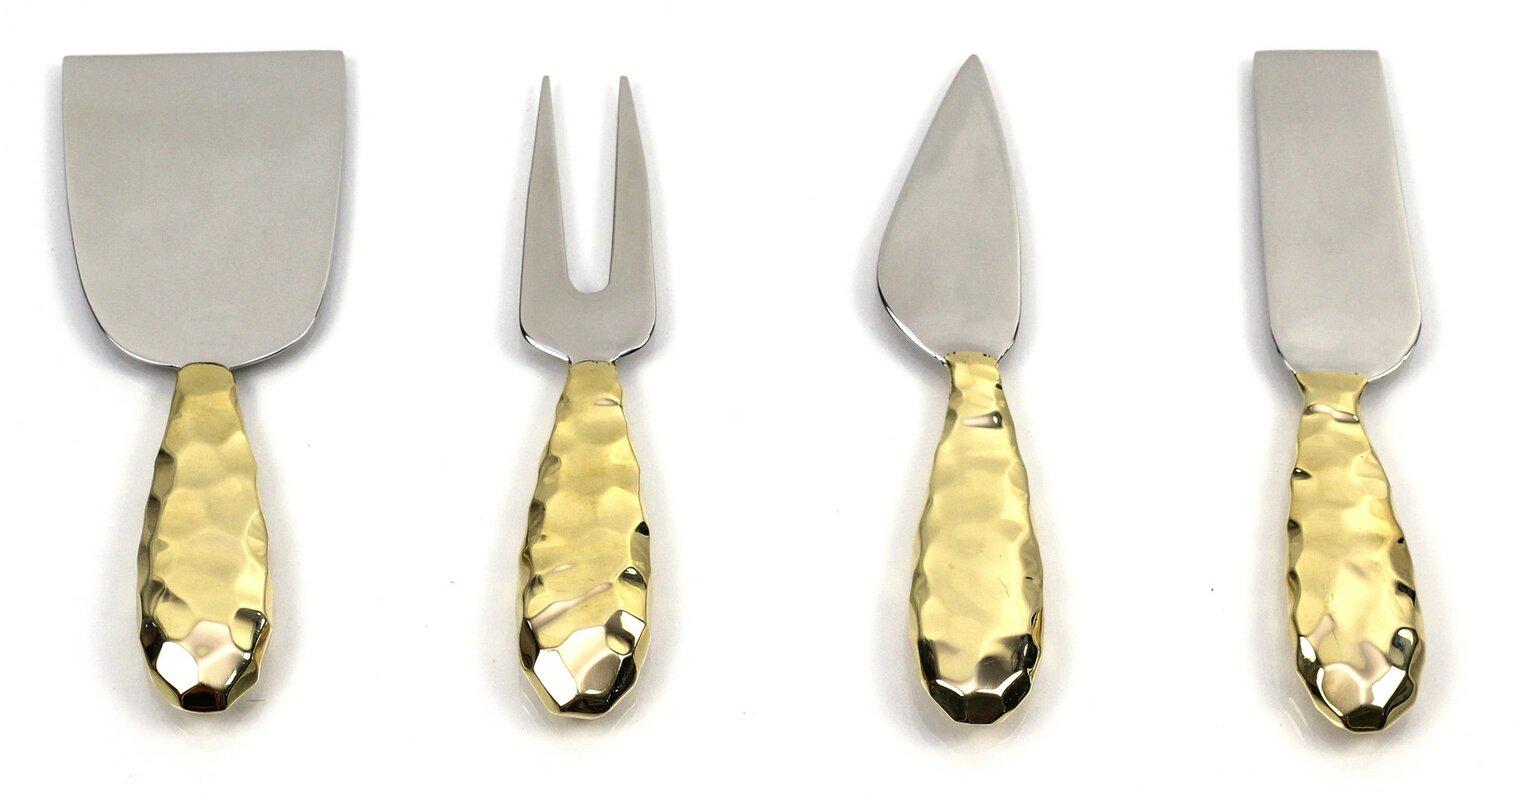 Lotus 4 Piece Cheese Knife Set